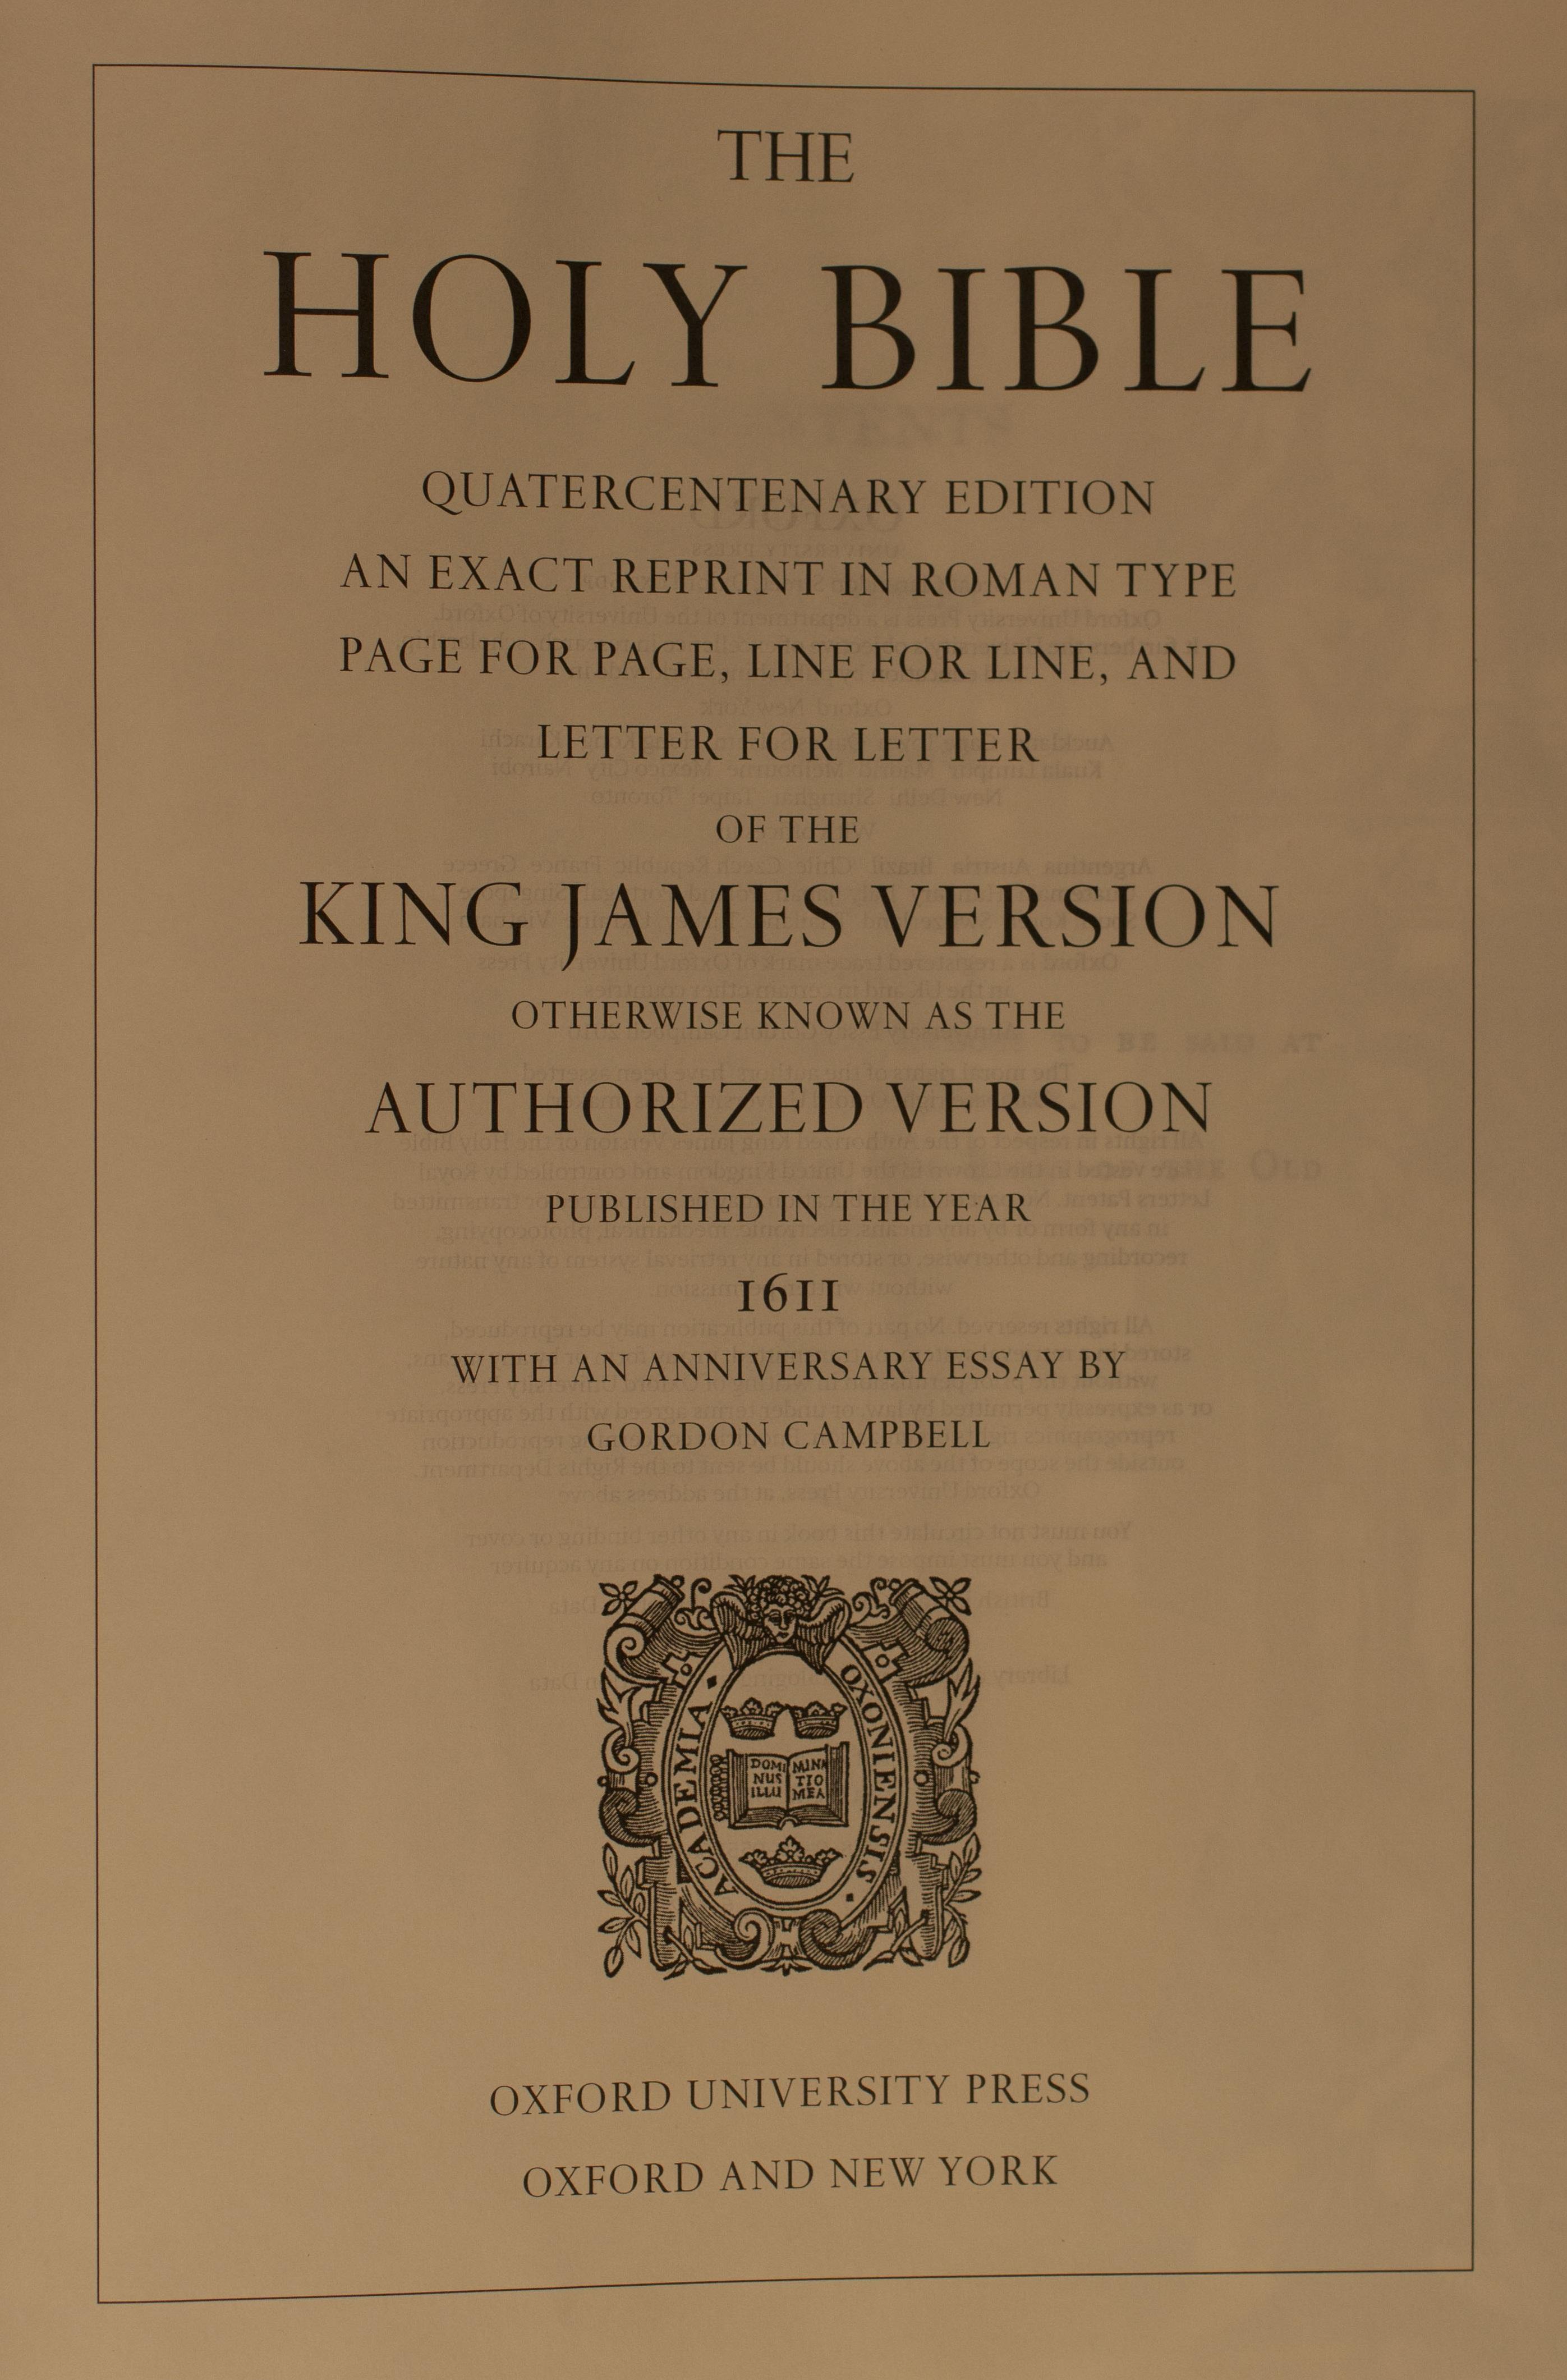 King James Bible Quatercentenary Edition